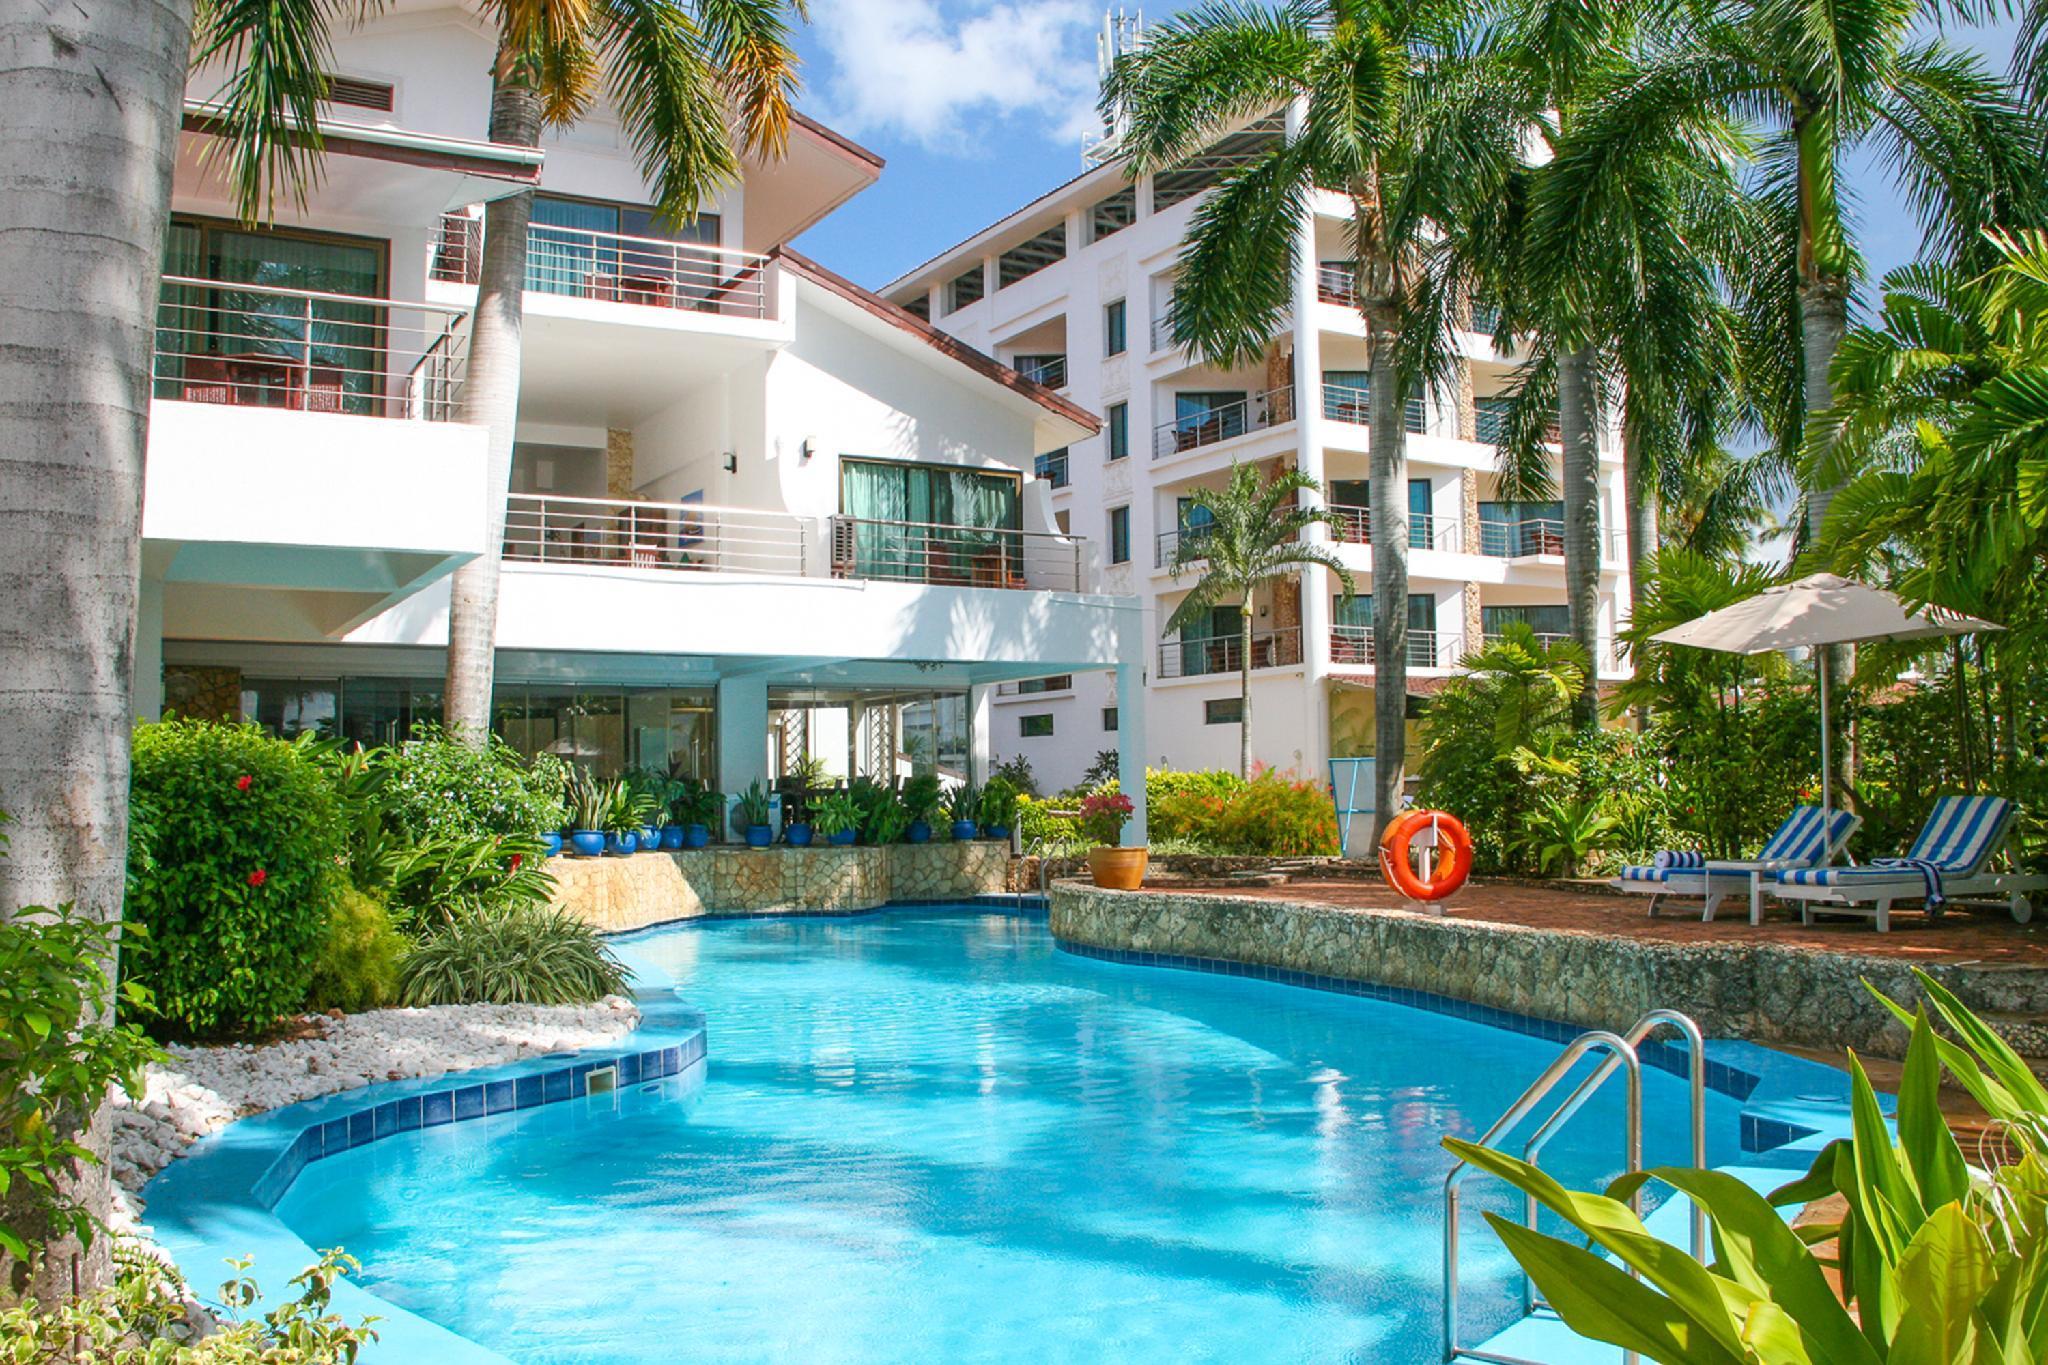 Best western coral beach hotel 2020